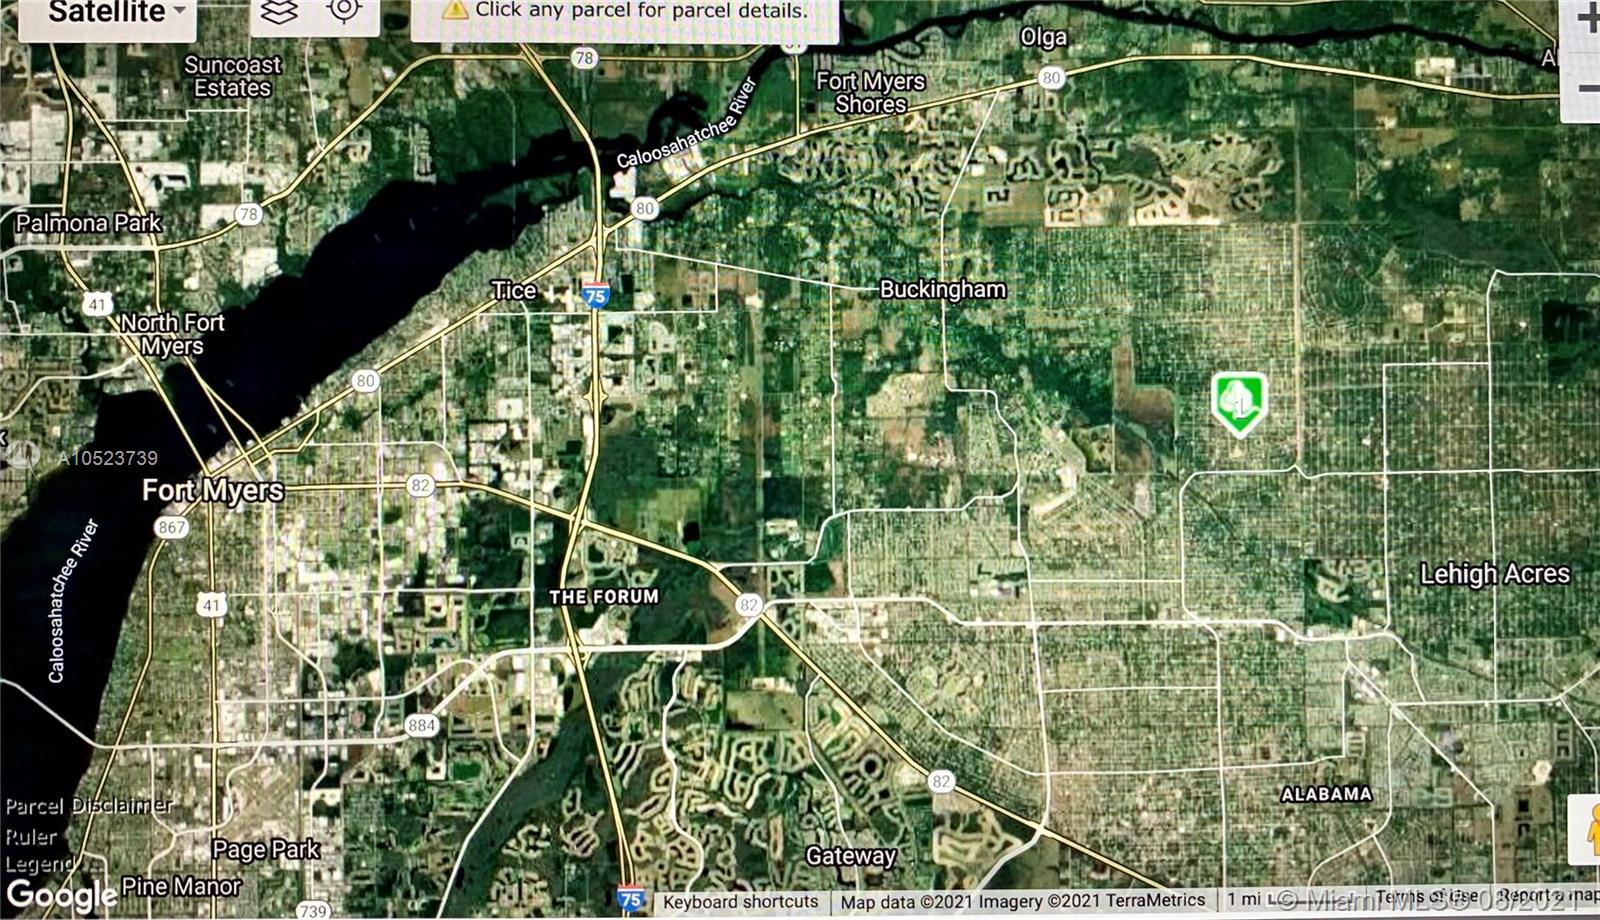 3701 June Av. North, Lehigh Acres FL 33971